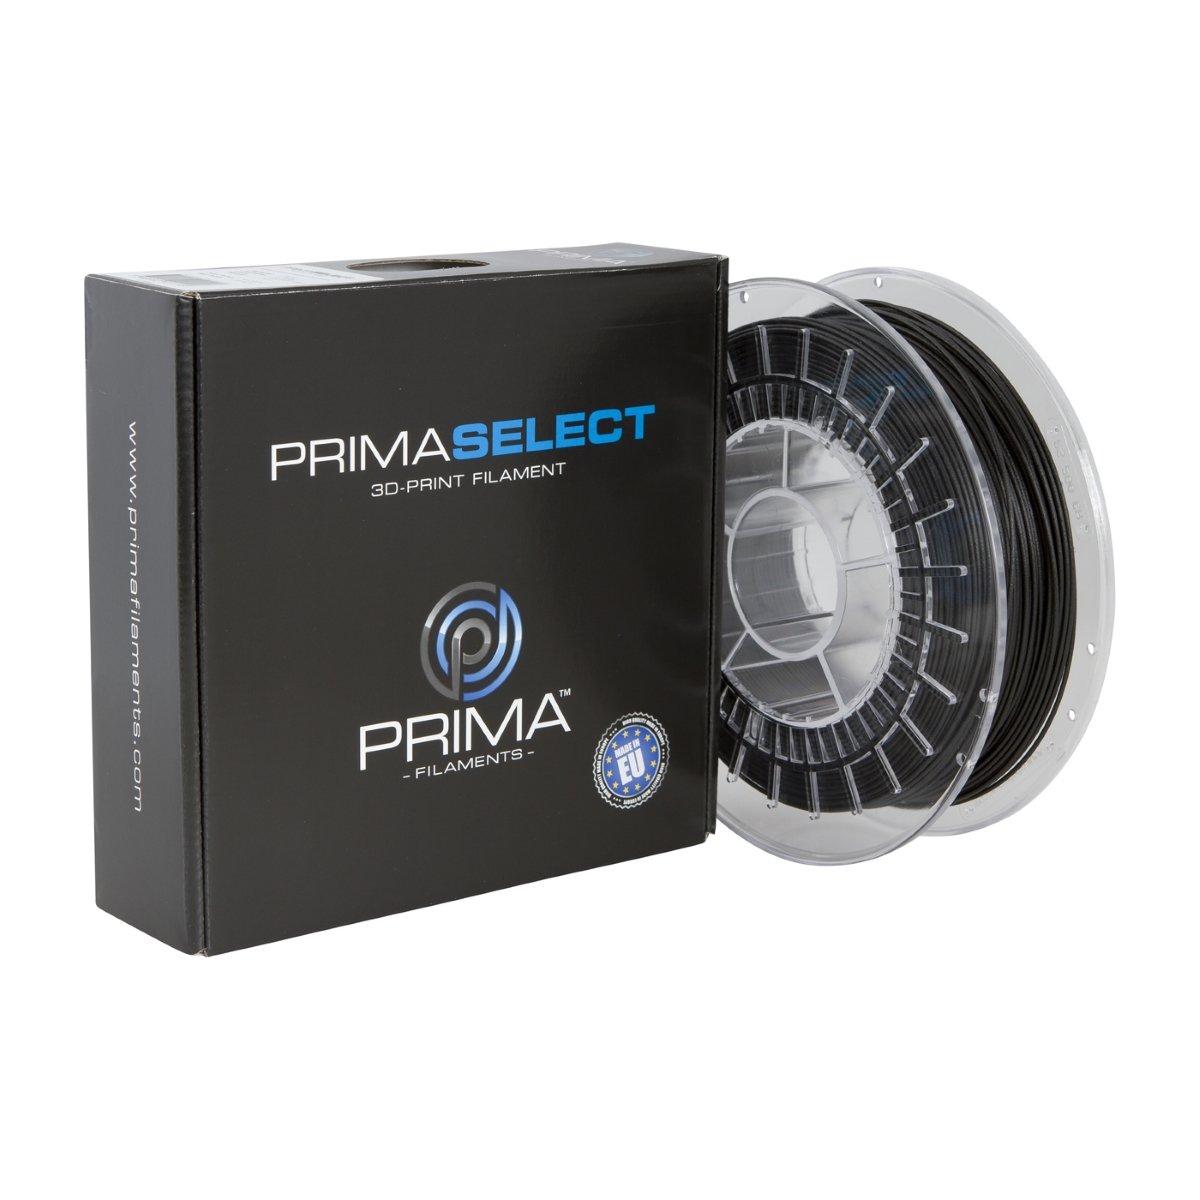 Image of PrimaSelect CARBON - 1.75mm - 500 g - Dark Grey